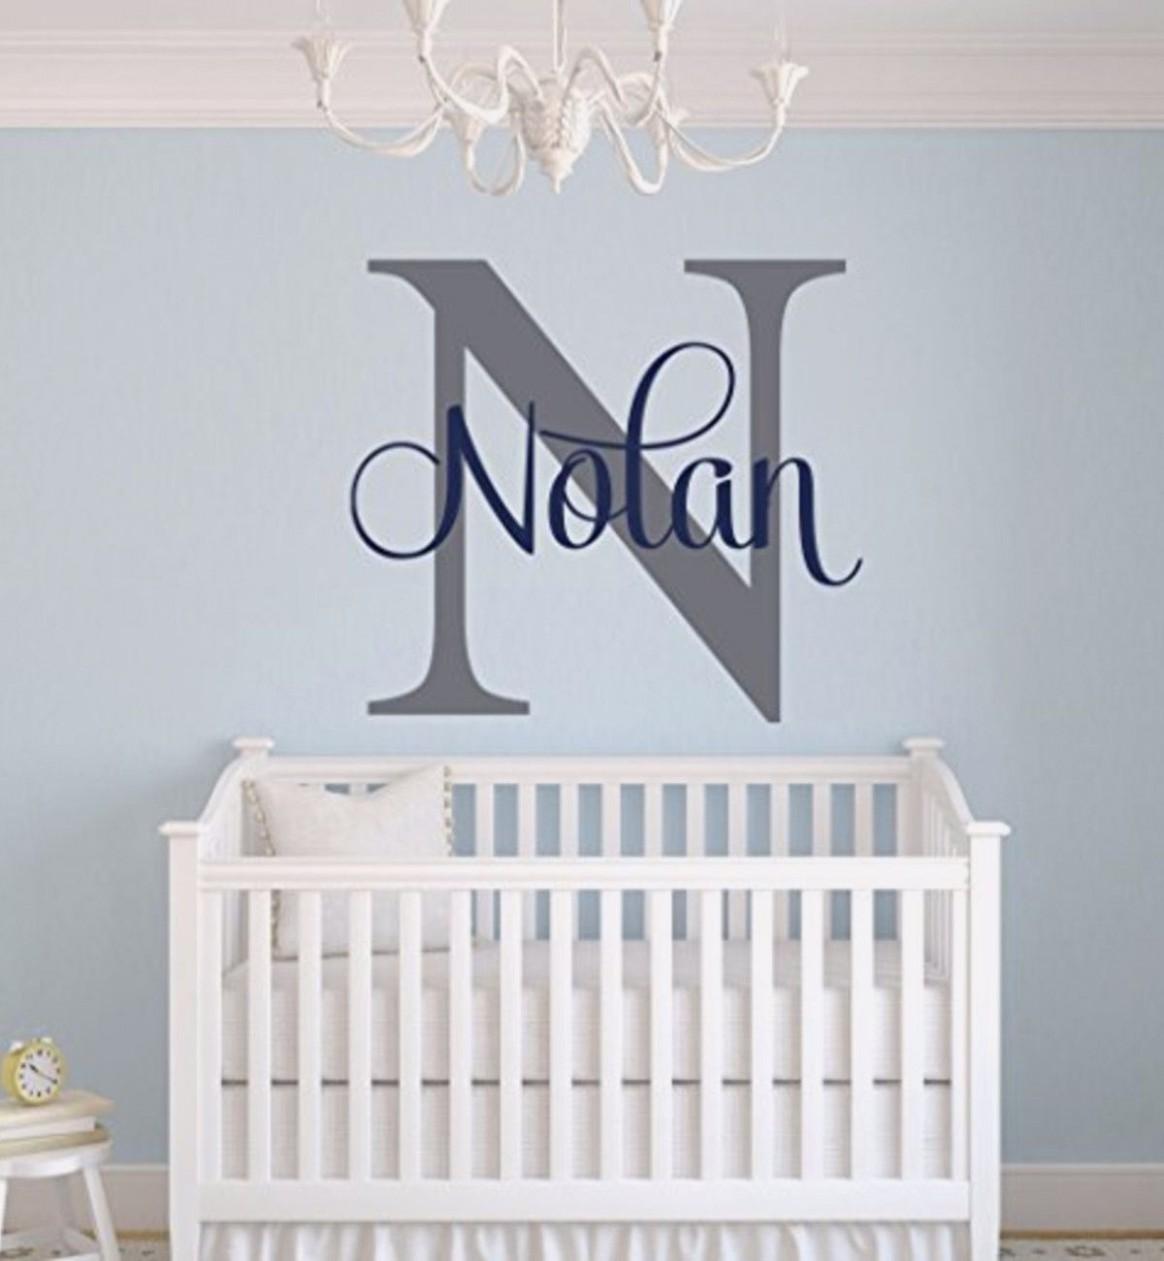 Unique Baby Boy Nursery Themes and Decor Ideas - Clever DIY Ideas  - Baby Room Wall Decor